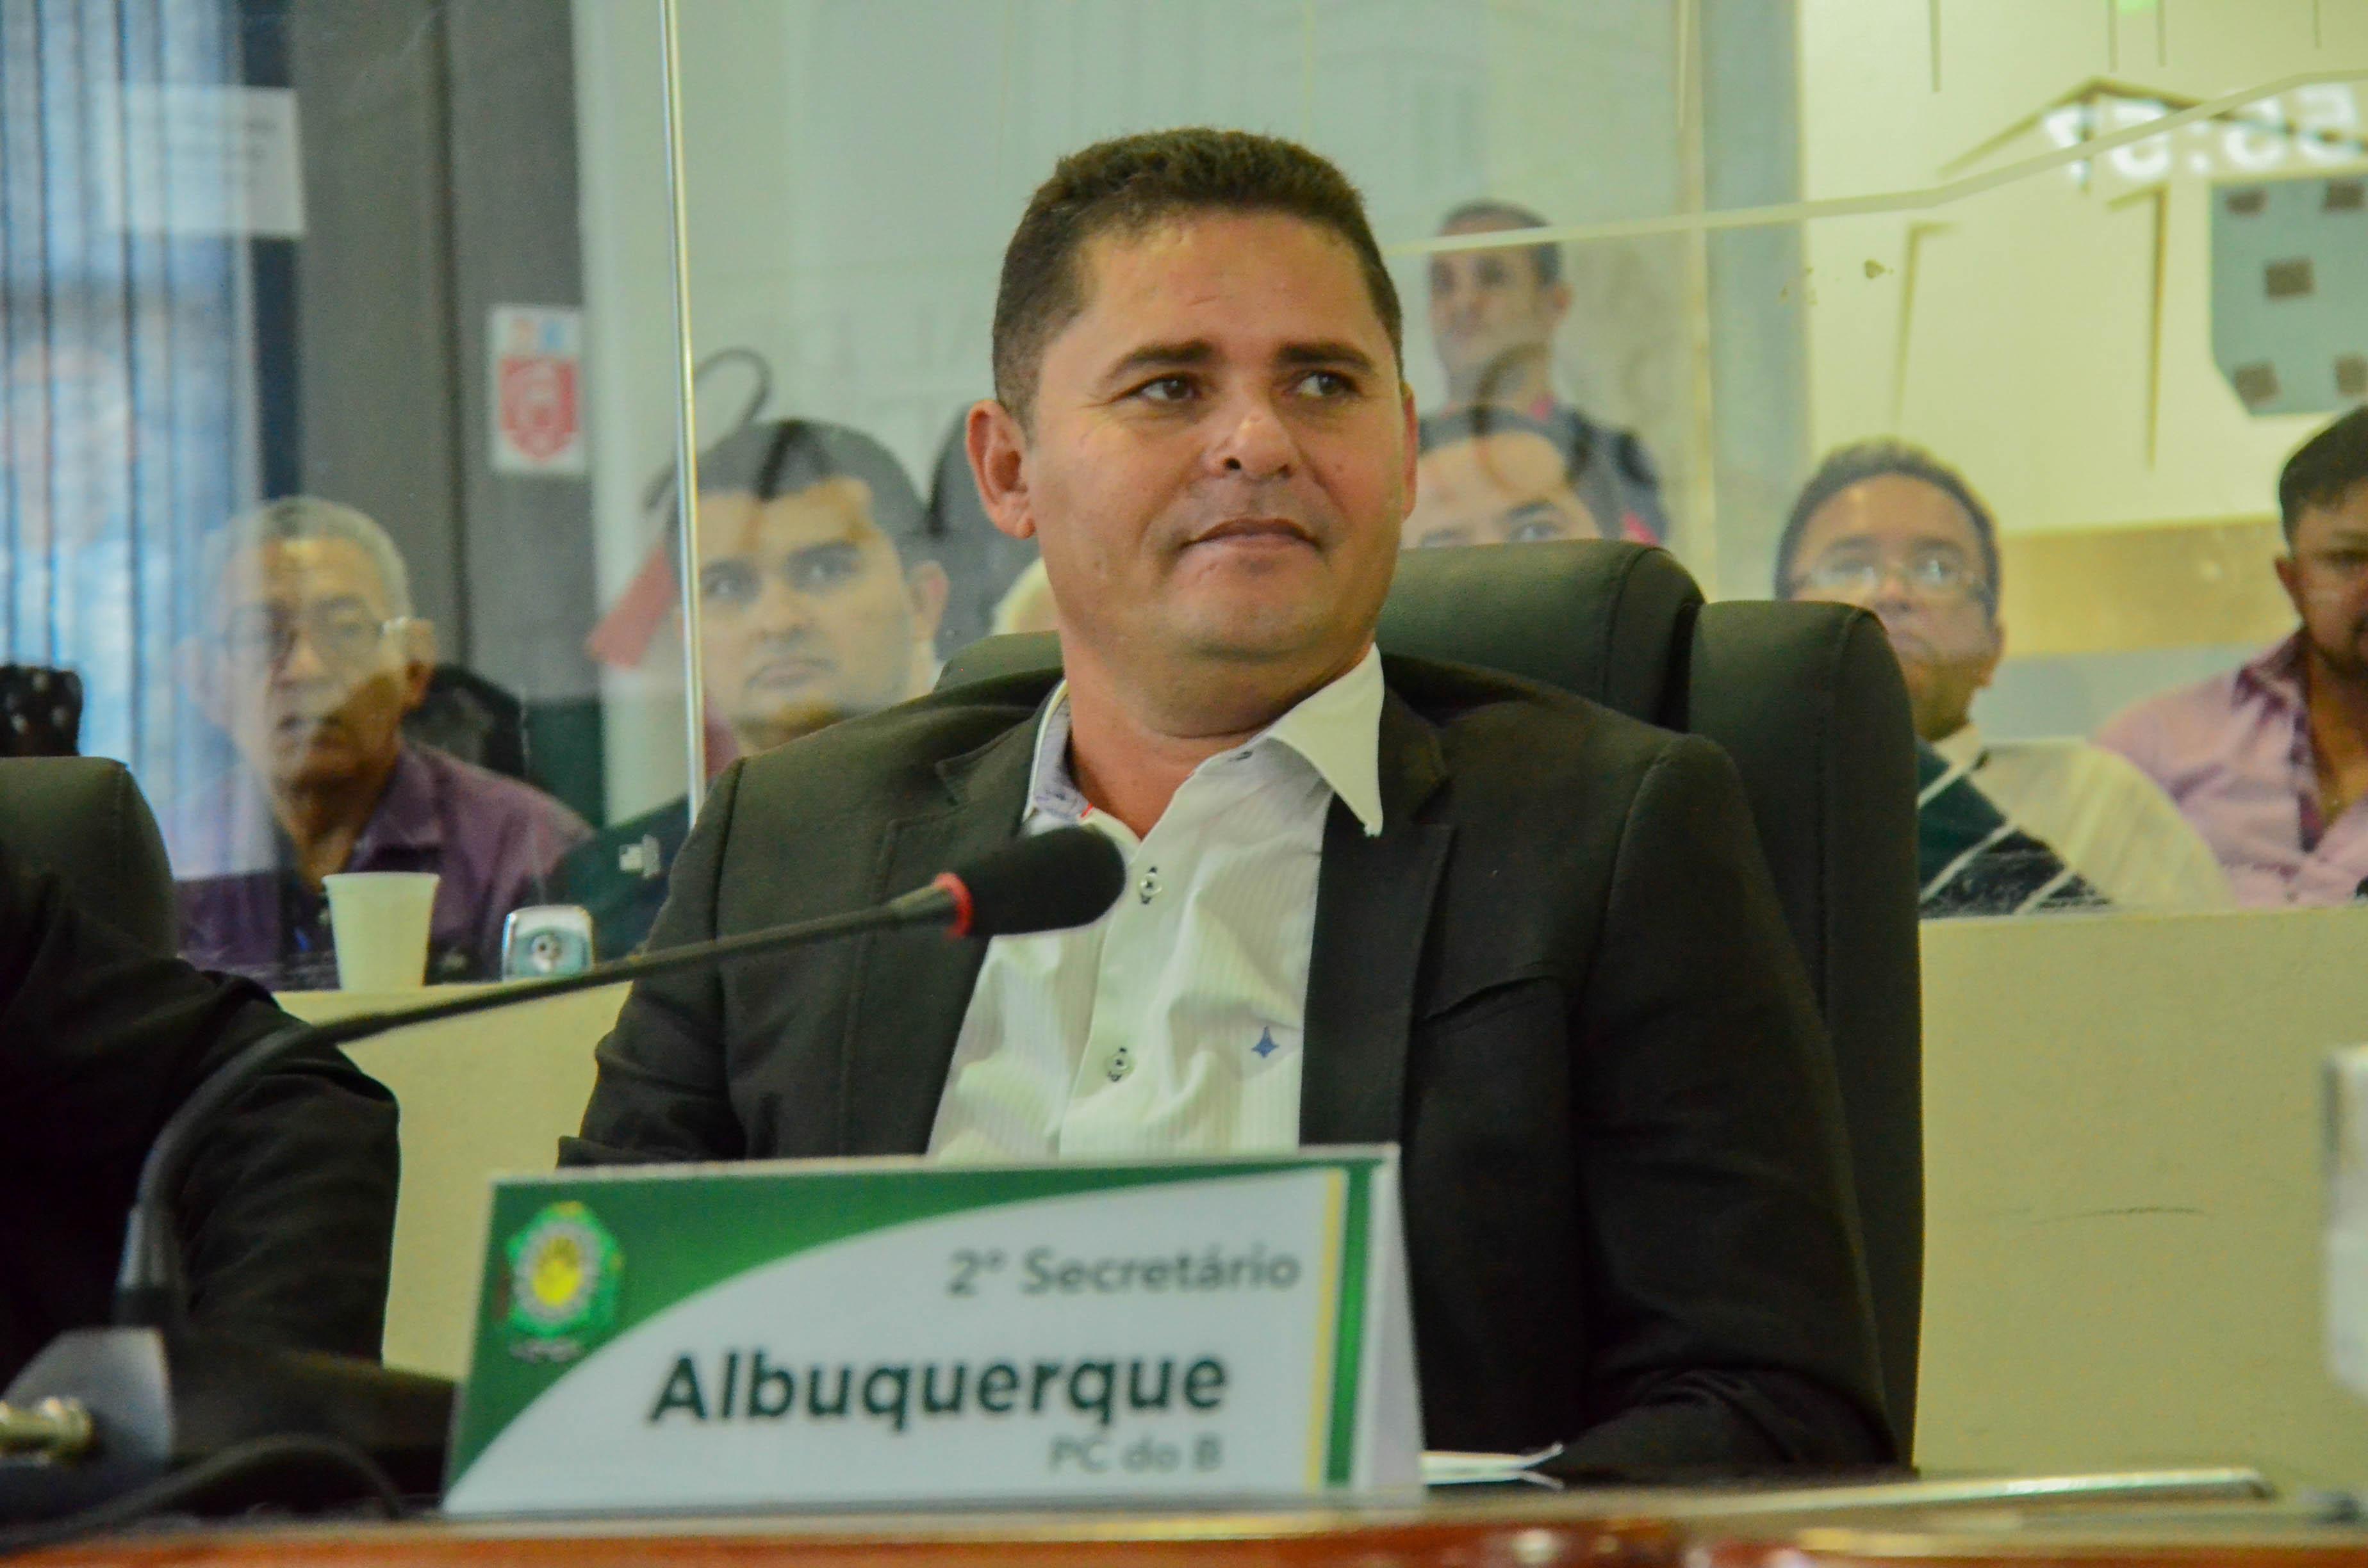 Aprovado Título de Cidadão Boavistense ao vereador Albuquerque